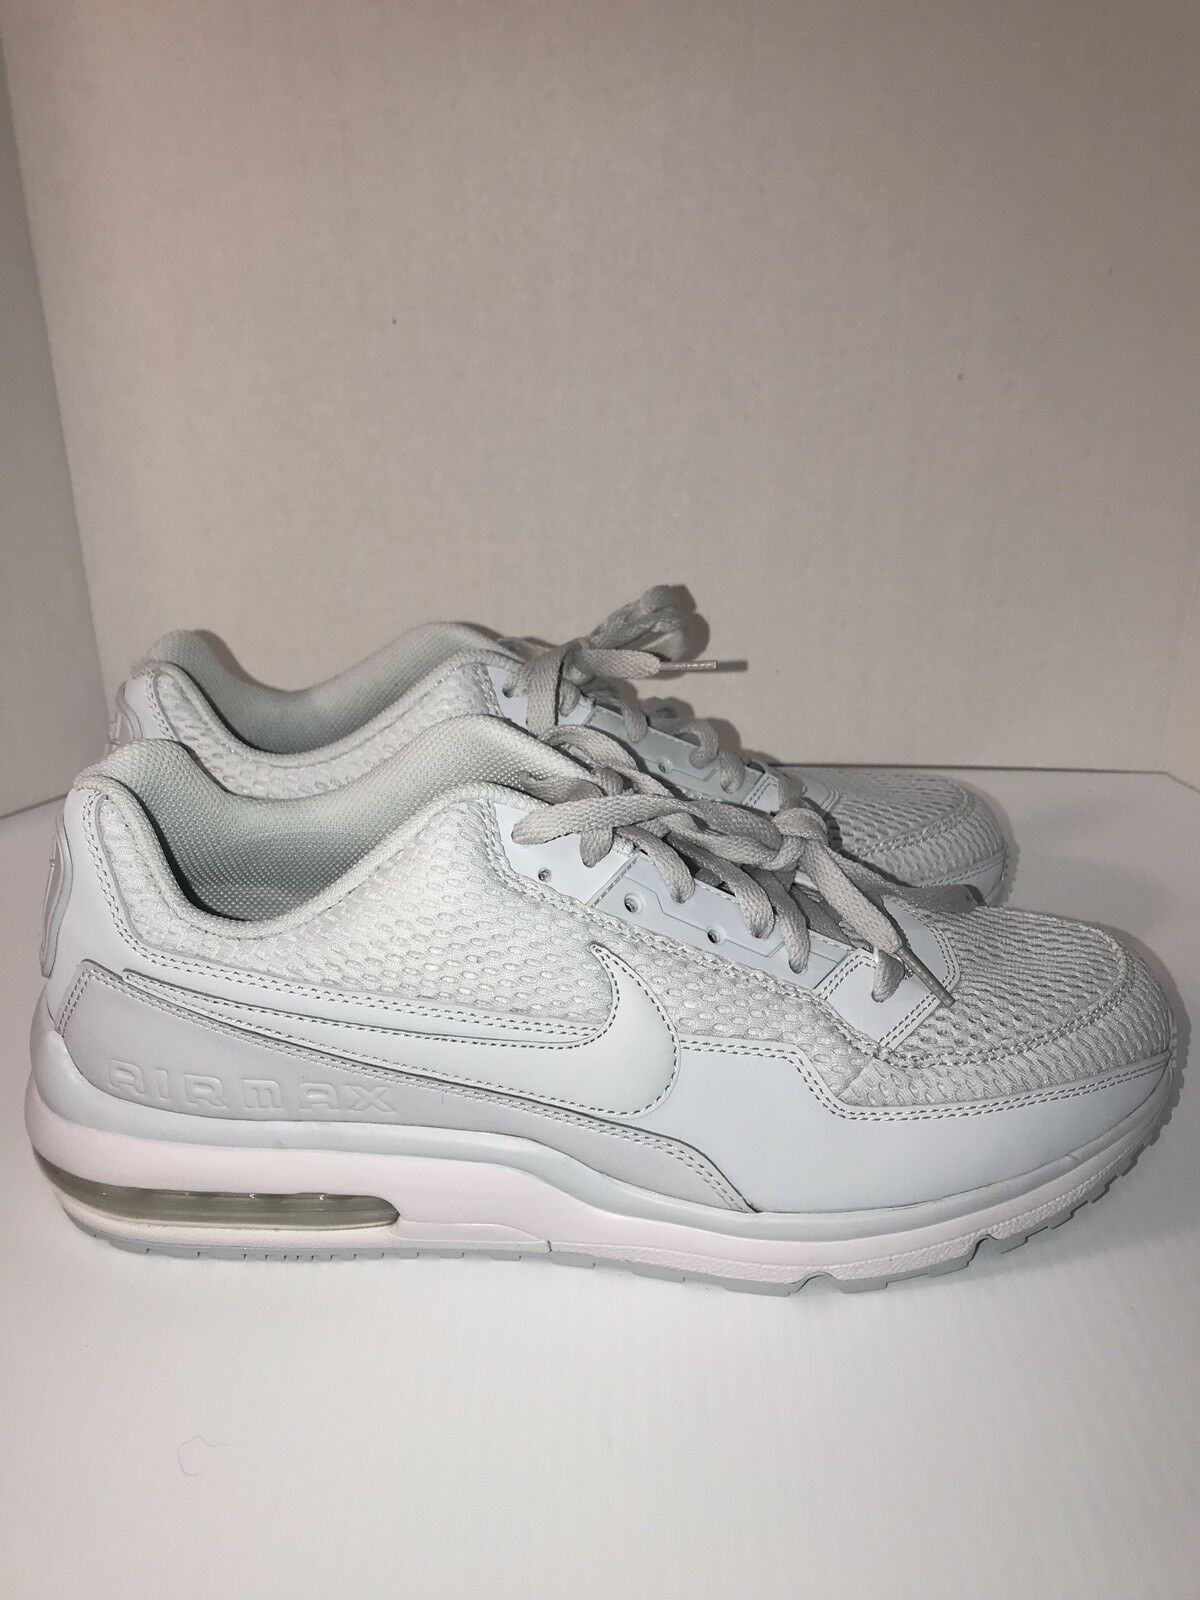 Nike Air Max LTD 3 BR Mens Size 13 Sneakers 842365-001 NEW